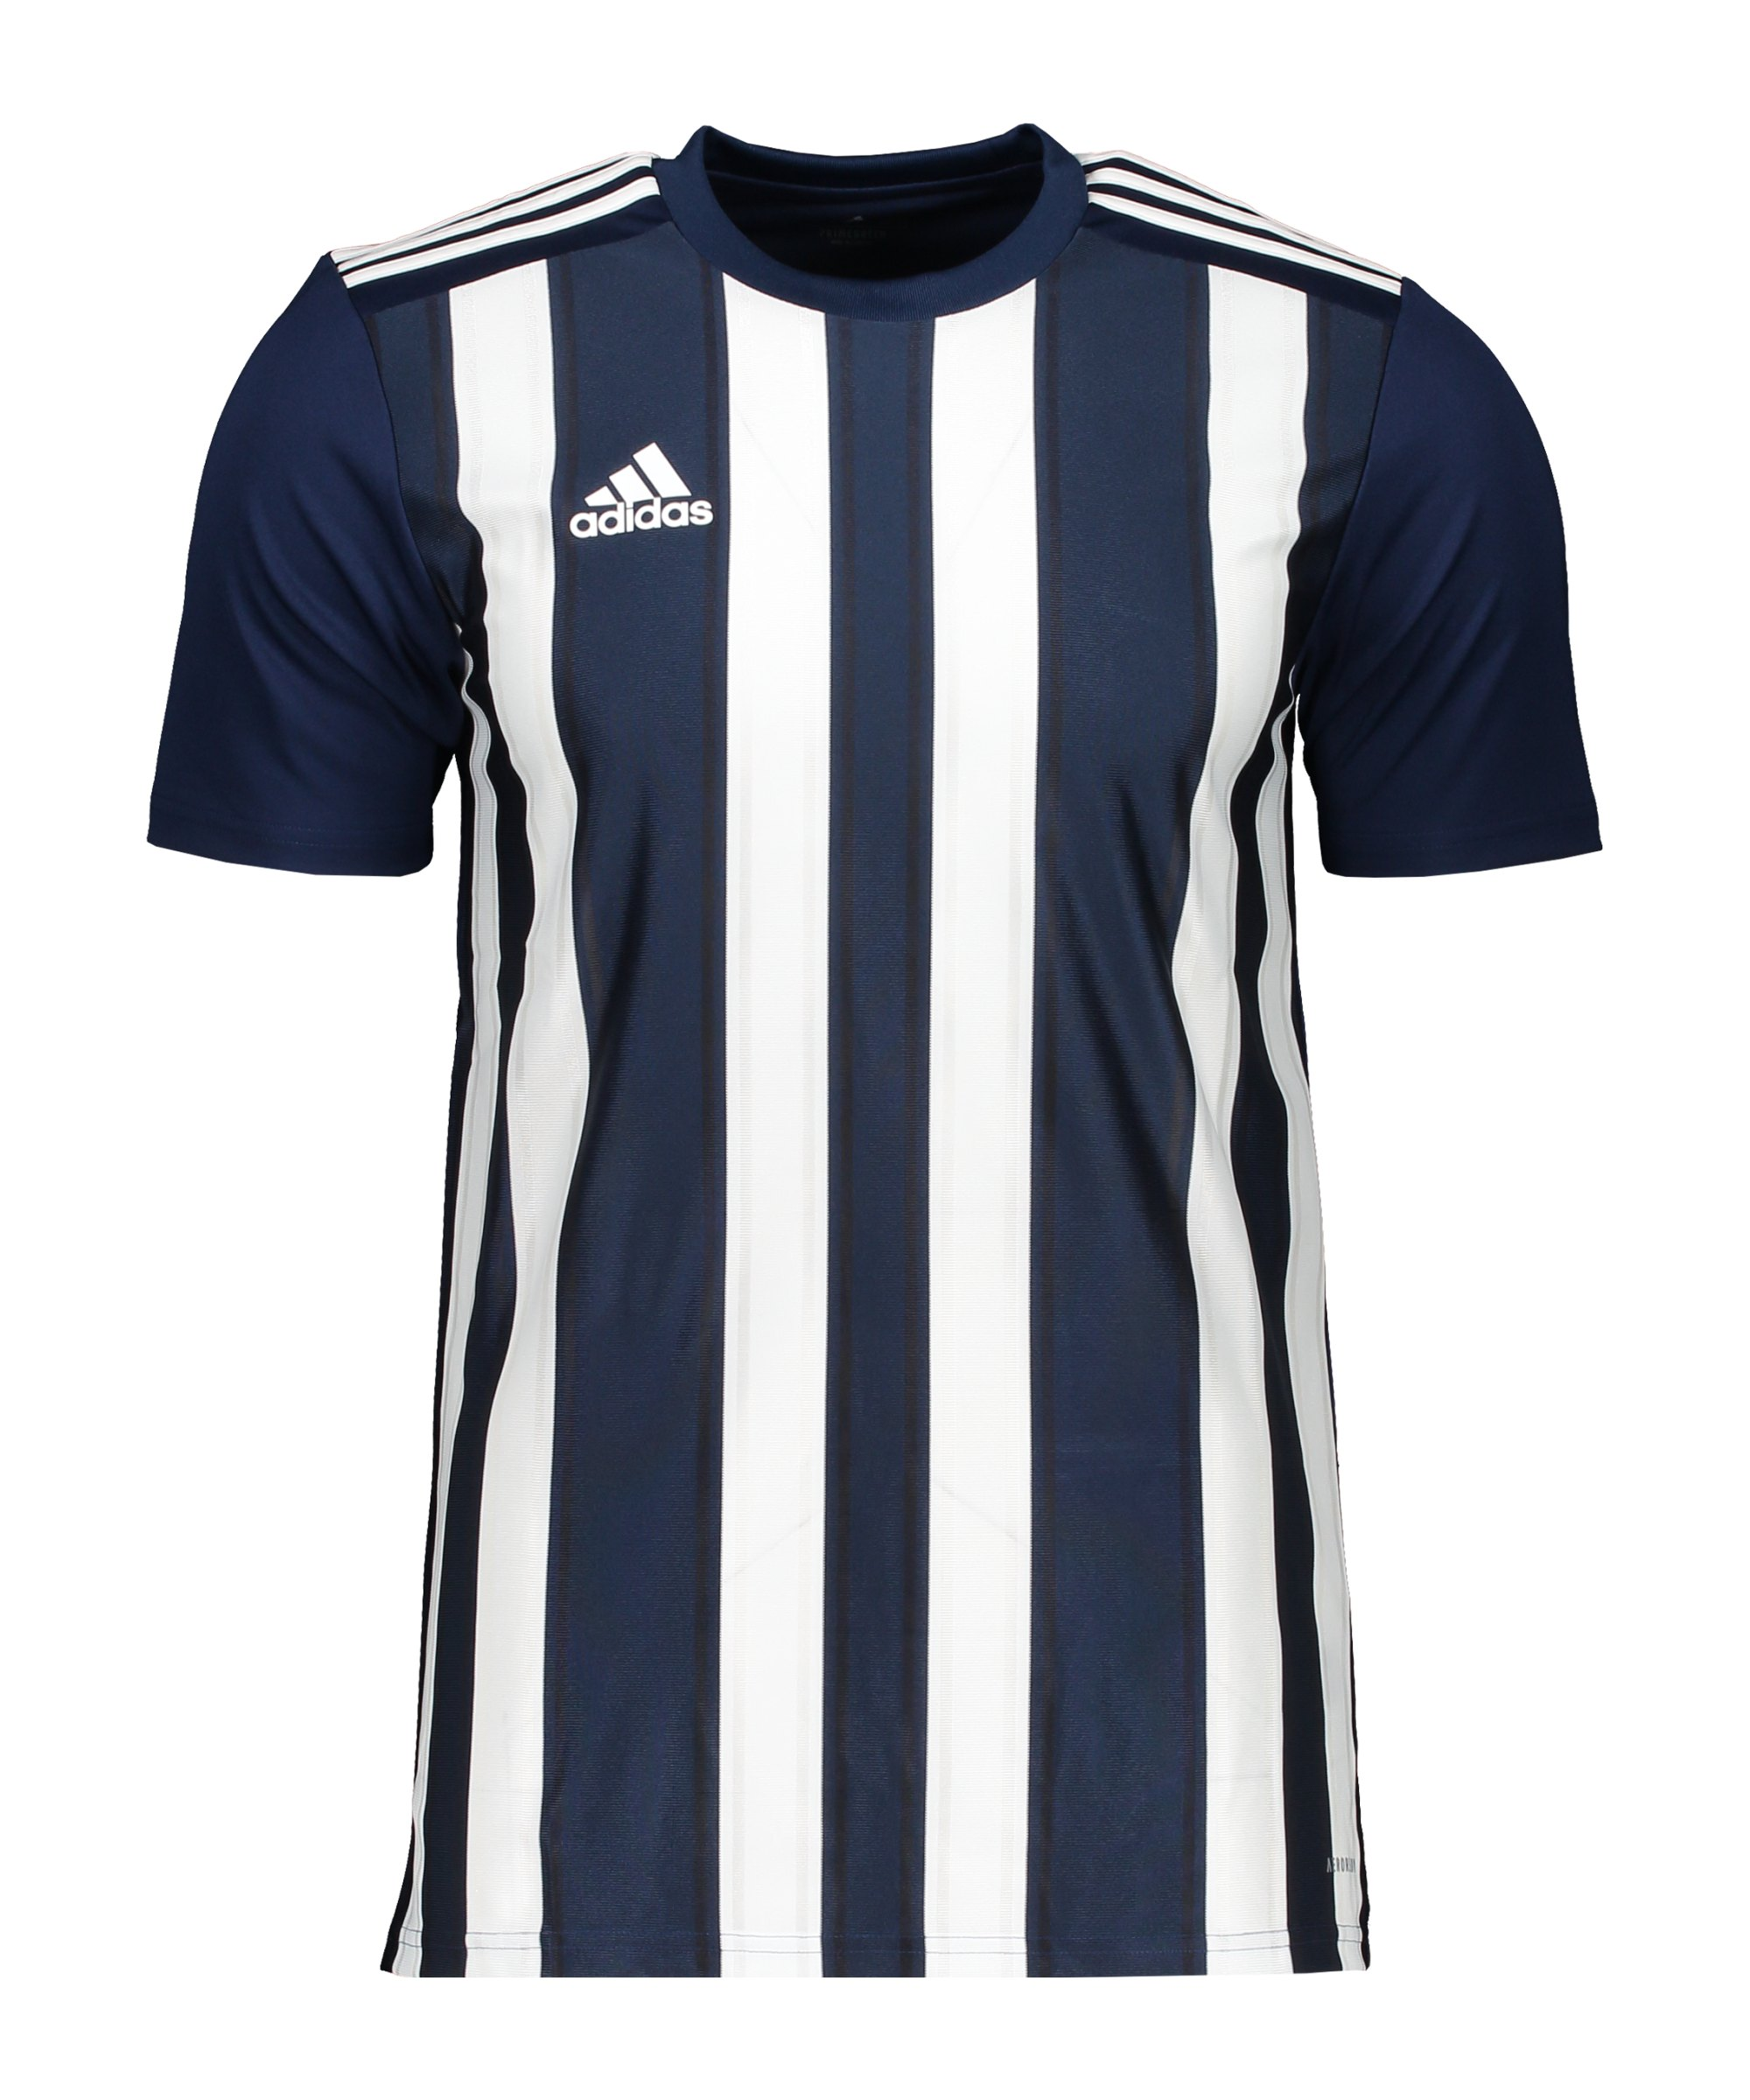 adidas Striped 21 Trikot Dunkelblau Weiss - blau